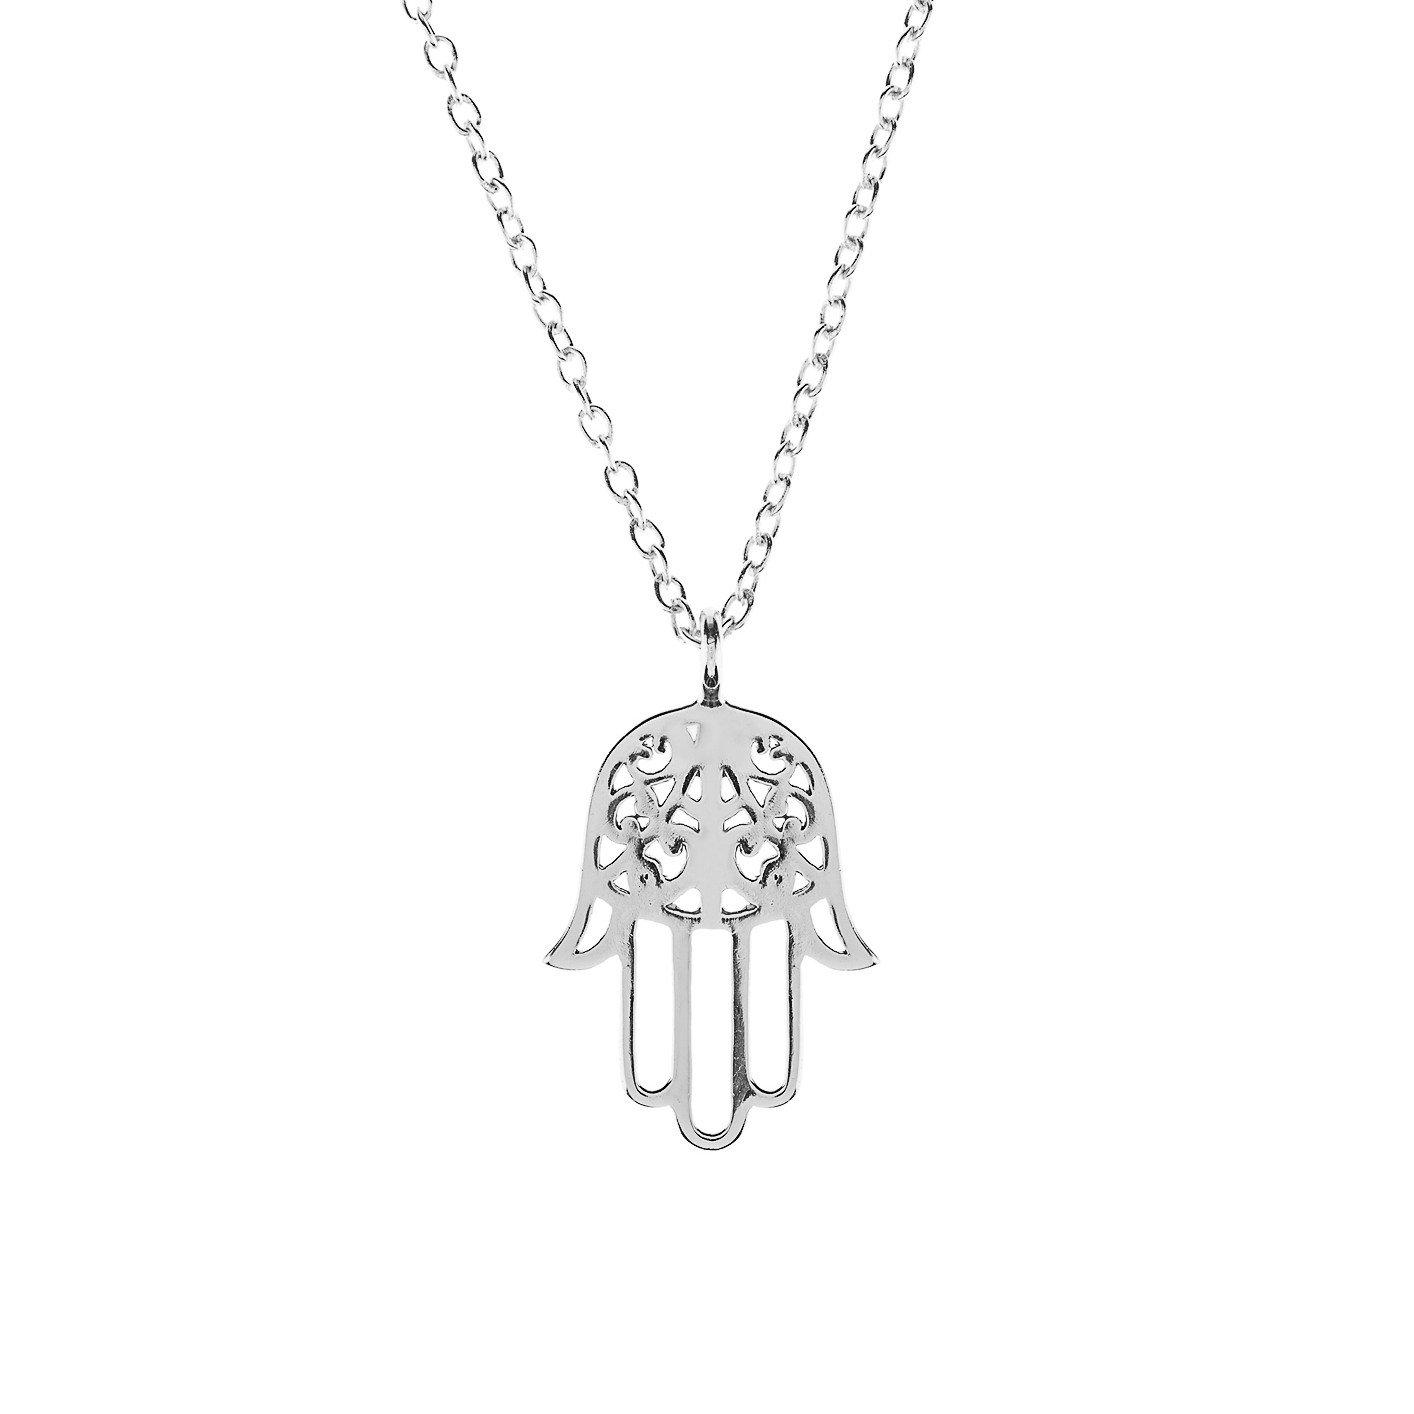 MESE London Hamsa Hand Necklace 18ct Gold Plated/ Platinum Plated Lucky Fatima Pendant - Elegant Gift Box cXnXC6xOcS